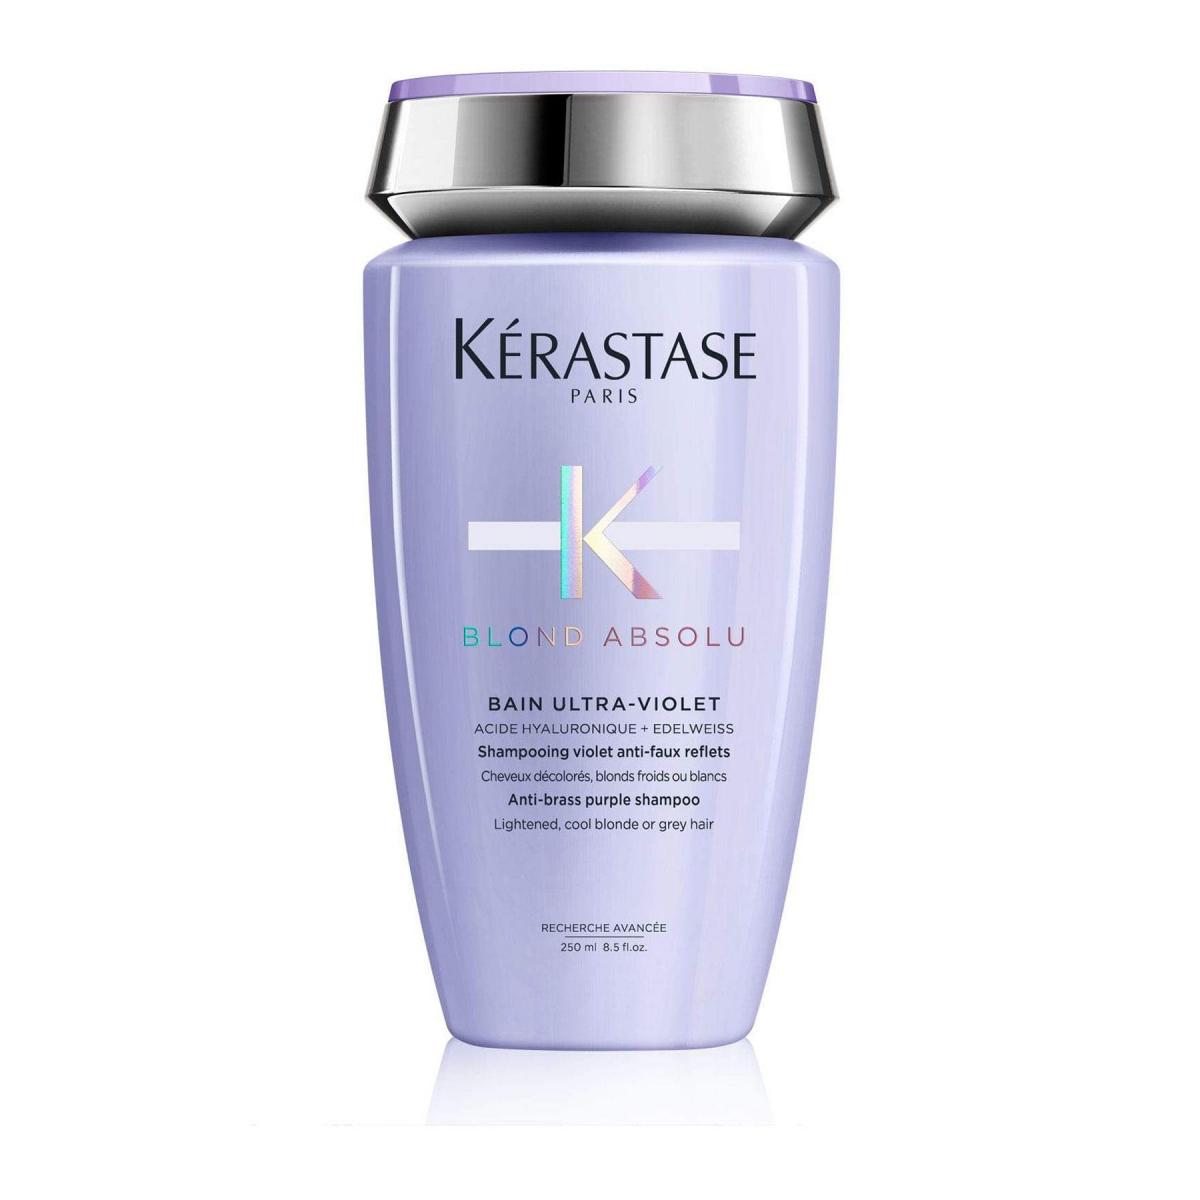 Kerastase Blond Absolu Bain Ultra Violet Şampuan 250ml